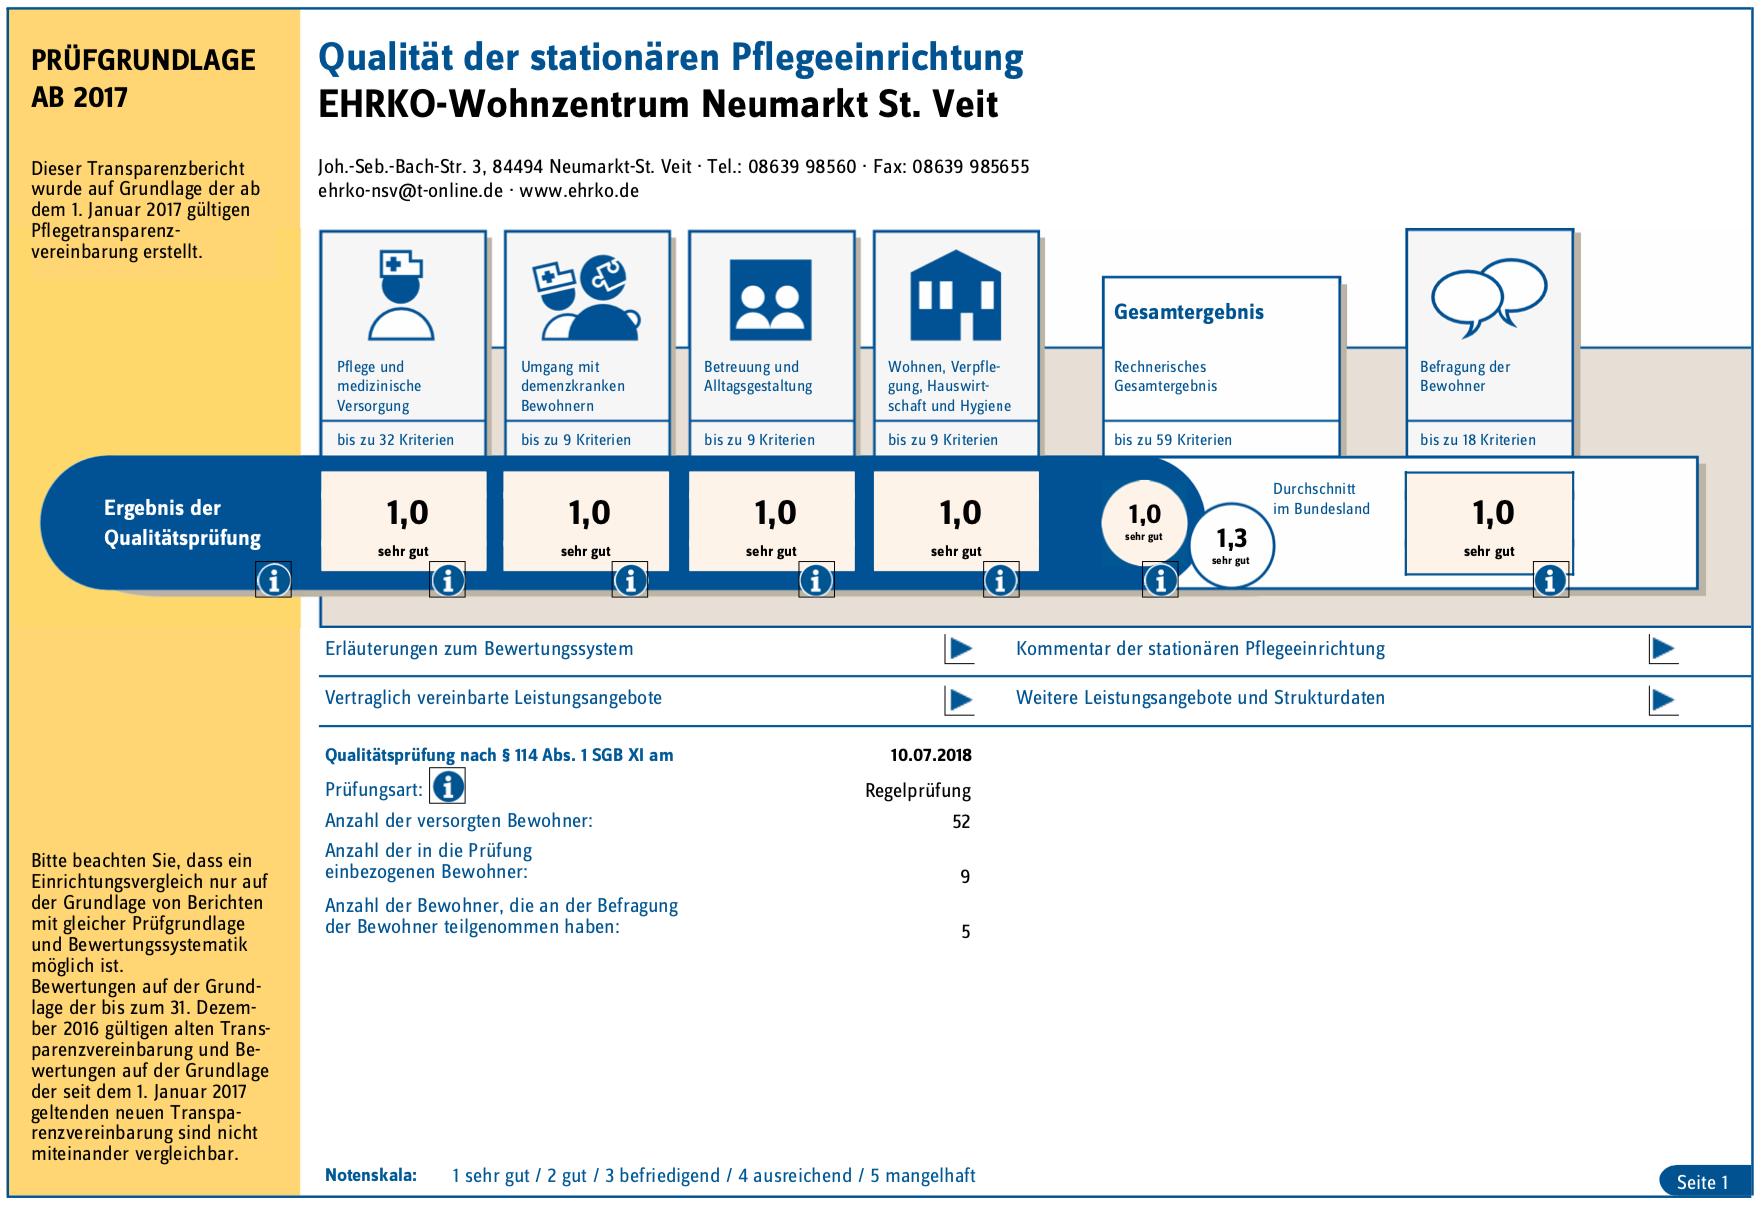 MDK-Prüfbericht 2018-EHRKO.png